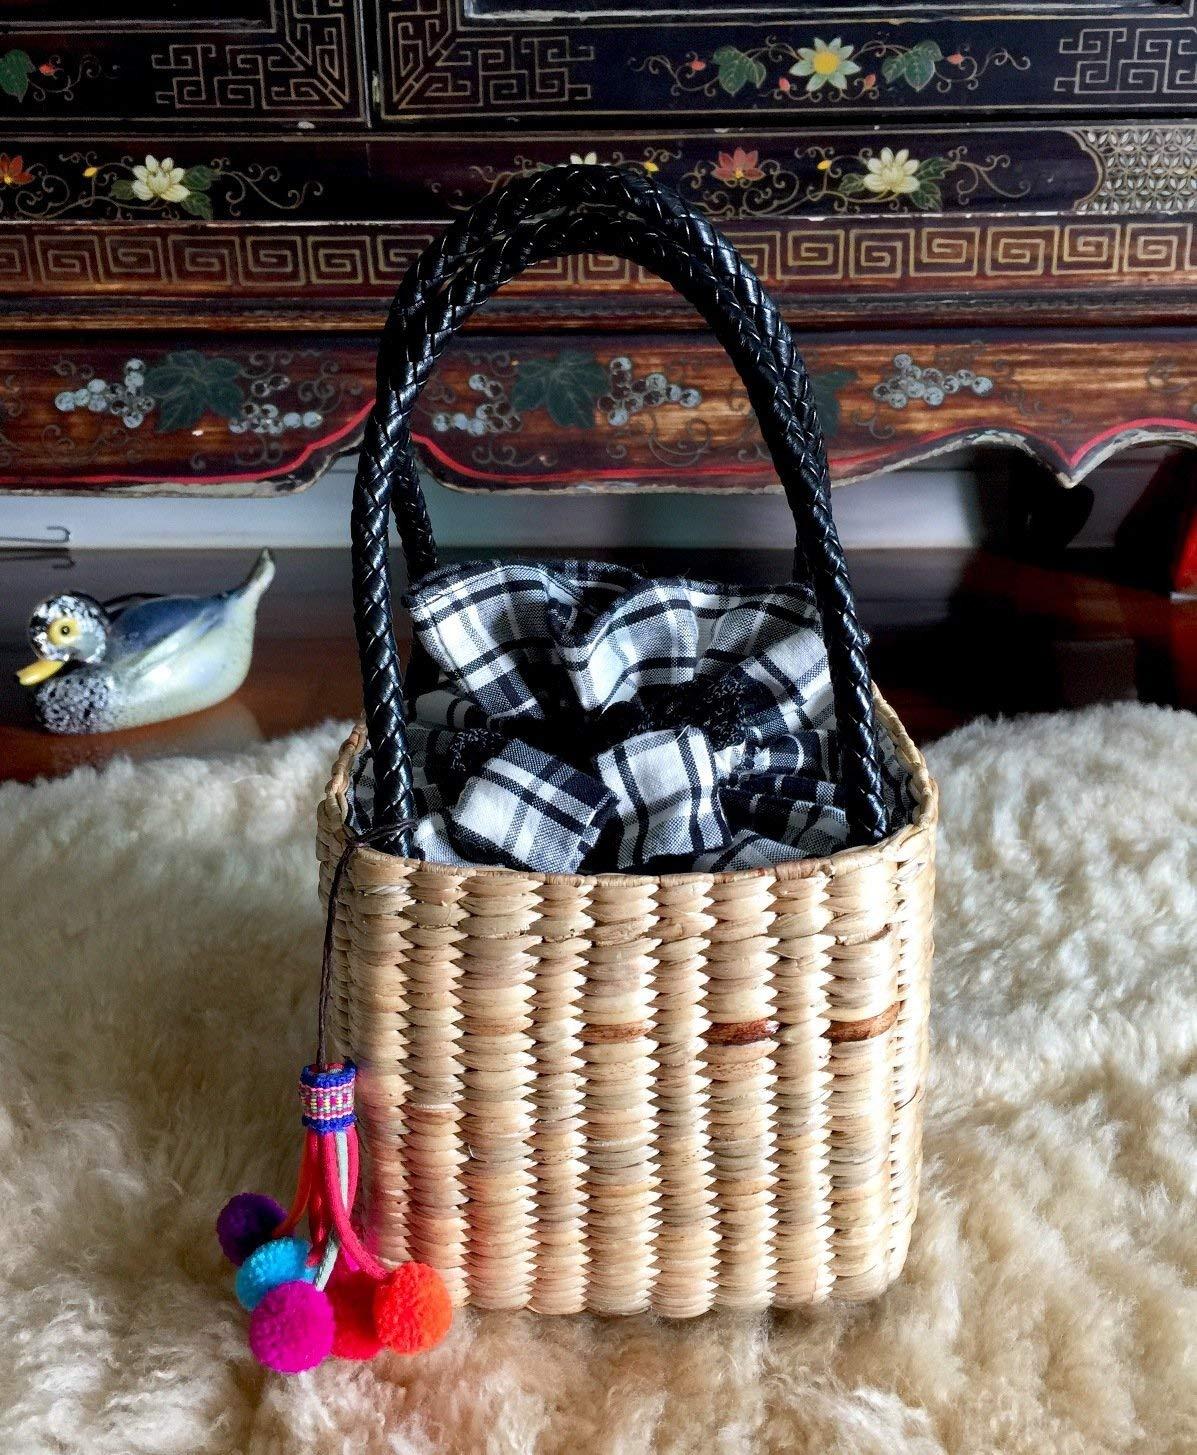 Handwoven Straw Bag,Mini Straw Tote Handbag,Mini Straw Bag,Straw Tote,Straw Basket Bag,Pom Pom Straw Bag,Straw Purse,Pom Pom Bag,Straw Beach Bag